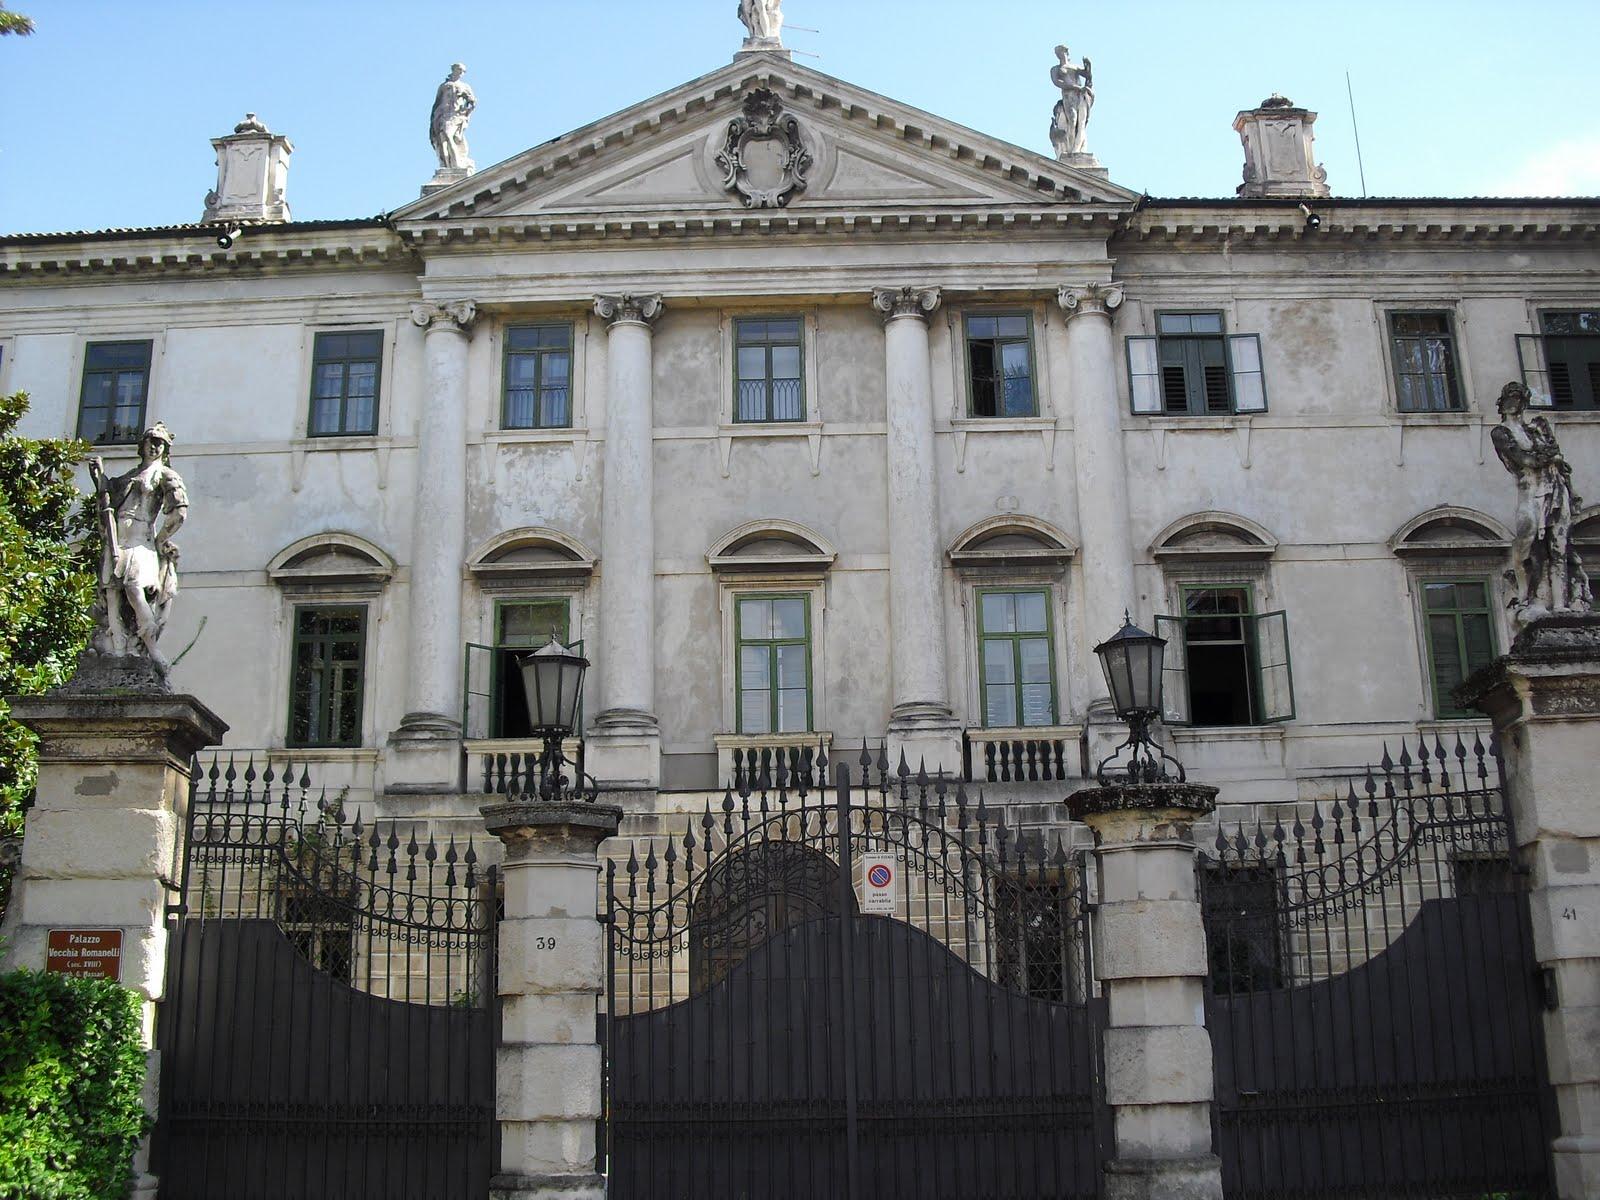 liceo biologico boscardin vicenza italy - photo#44